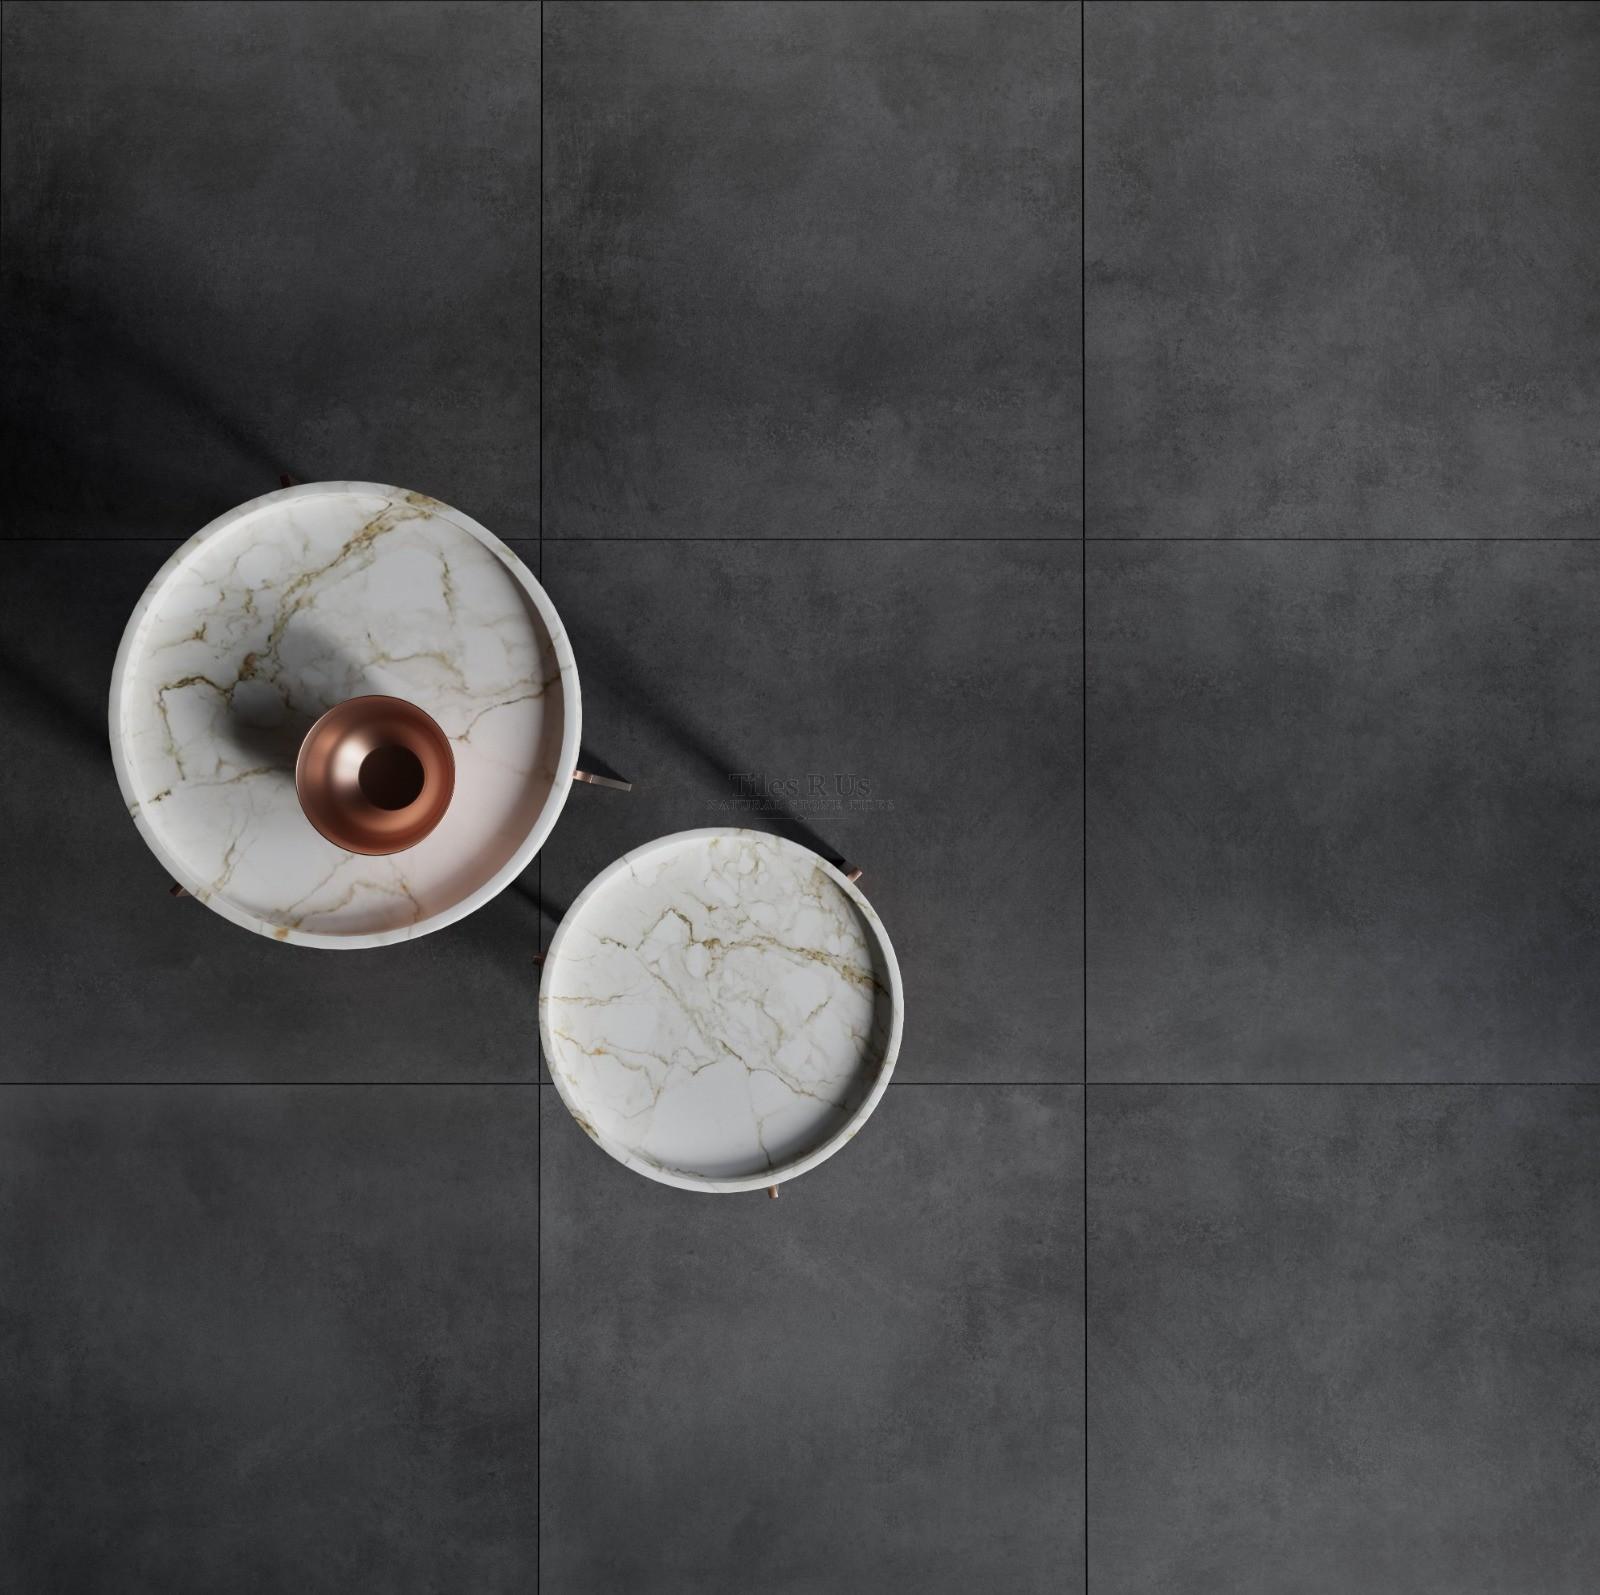 Chaldean Black Porcelain - Matt